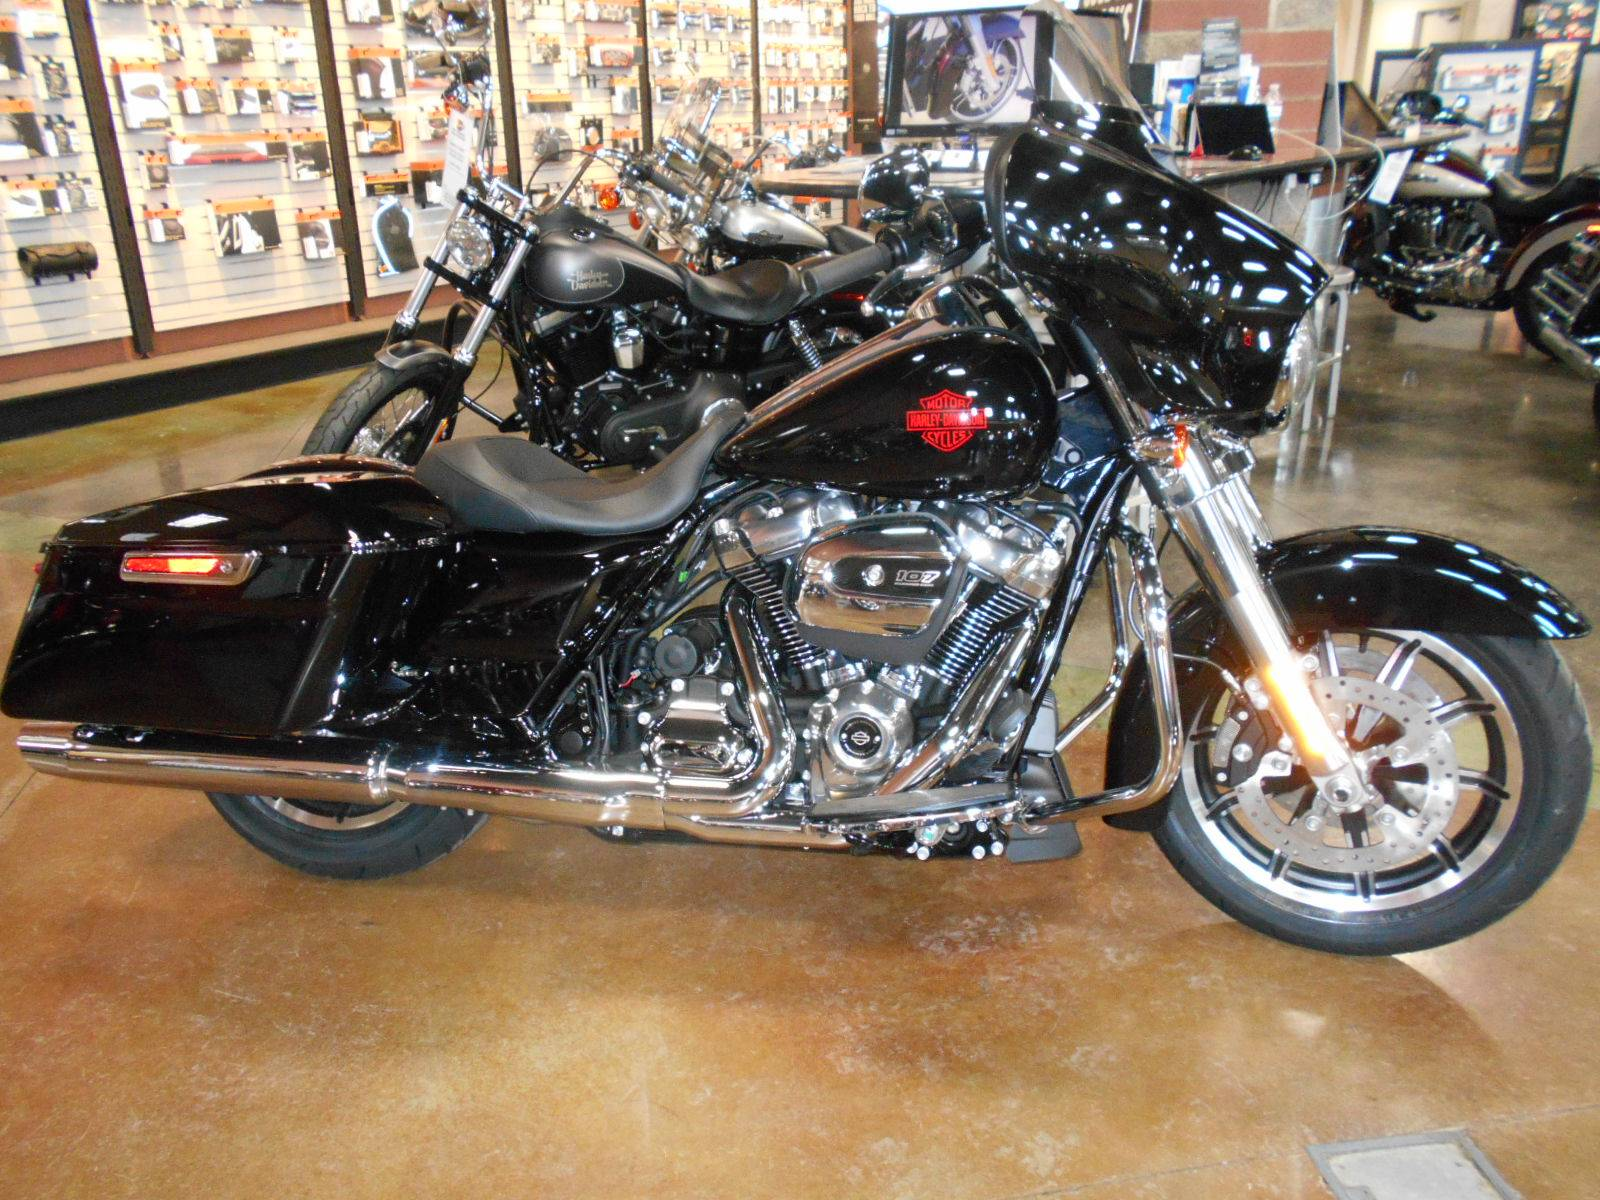 1197d52134f 2019 Harley-Davidson Electra Glide® Standard in Mauston, Wisconsin